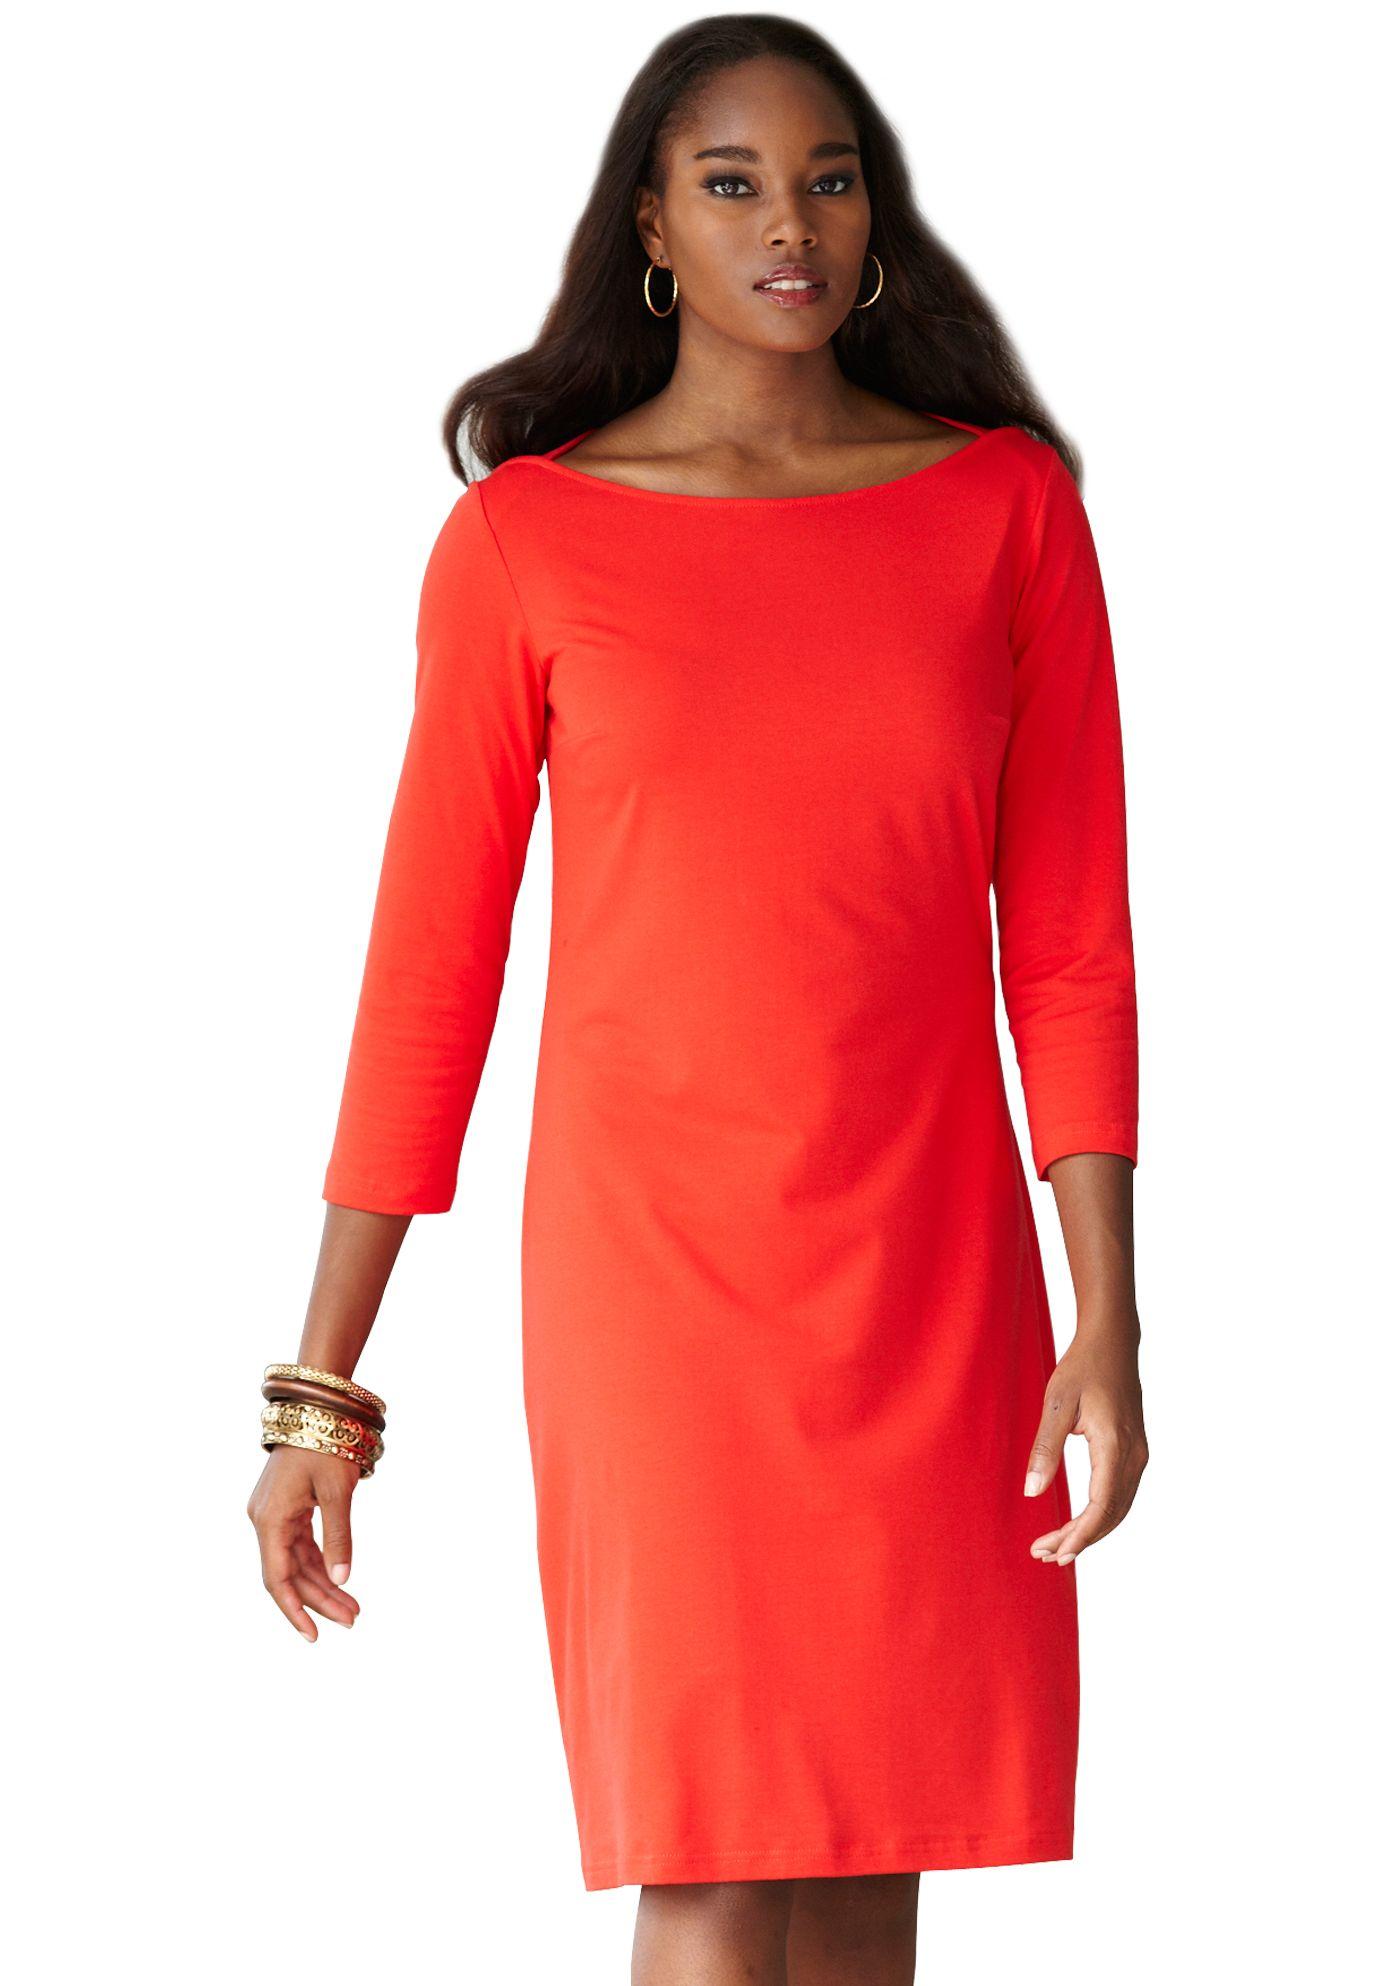 Classic Boatneck Dress Fashion Plus Size Women Pinterest Mom